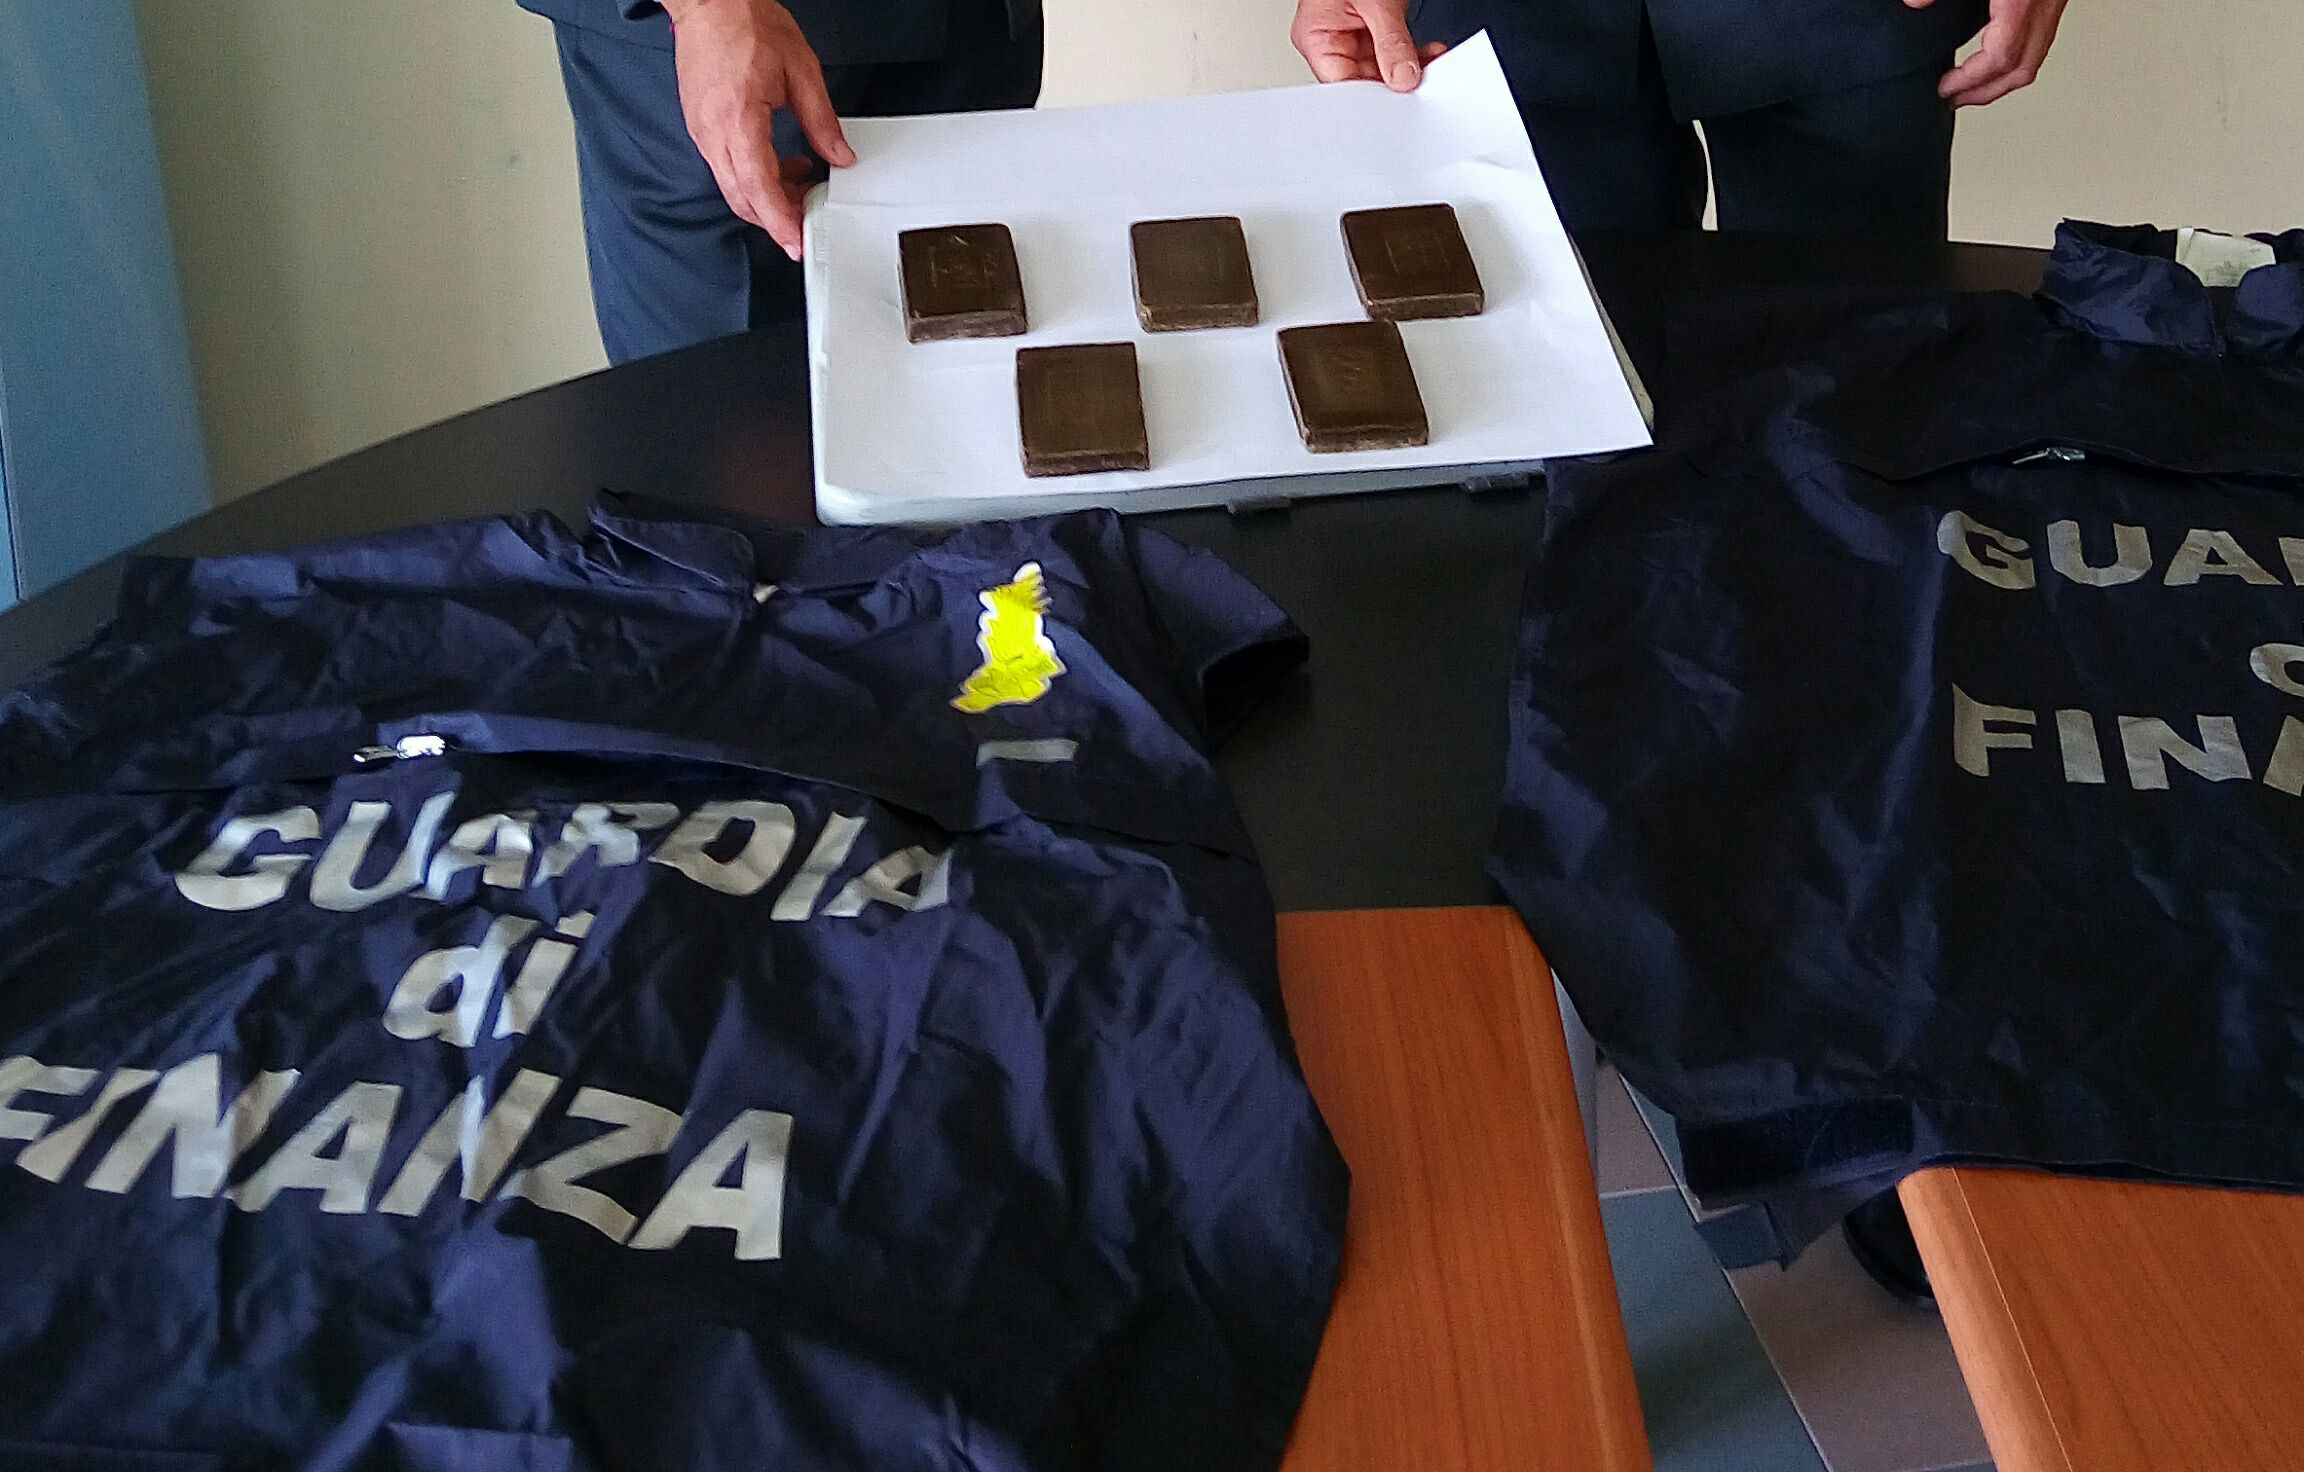 #Pomezia, i Carabinieri arrestano un pusher con 5 kg di hashish